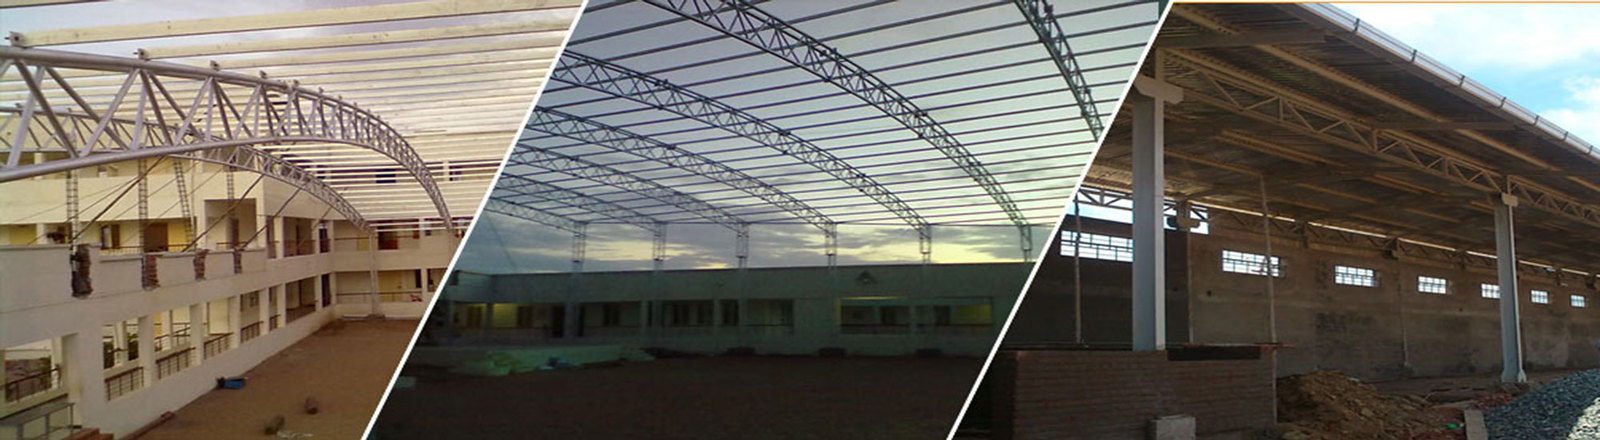 terrace-civil-metal-polycarbonate-industrial-roofing-contractors-chennai-tamilnadu-kerala-india